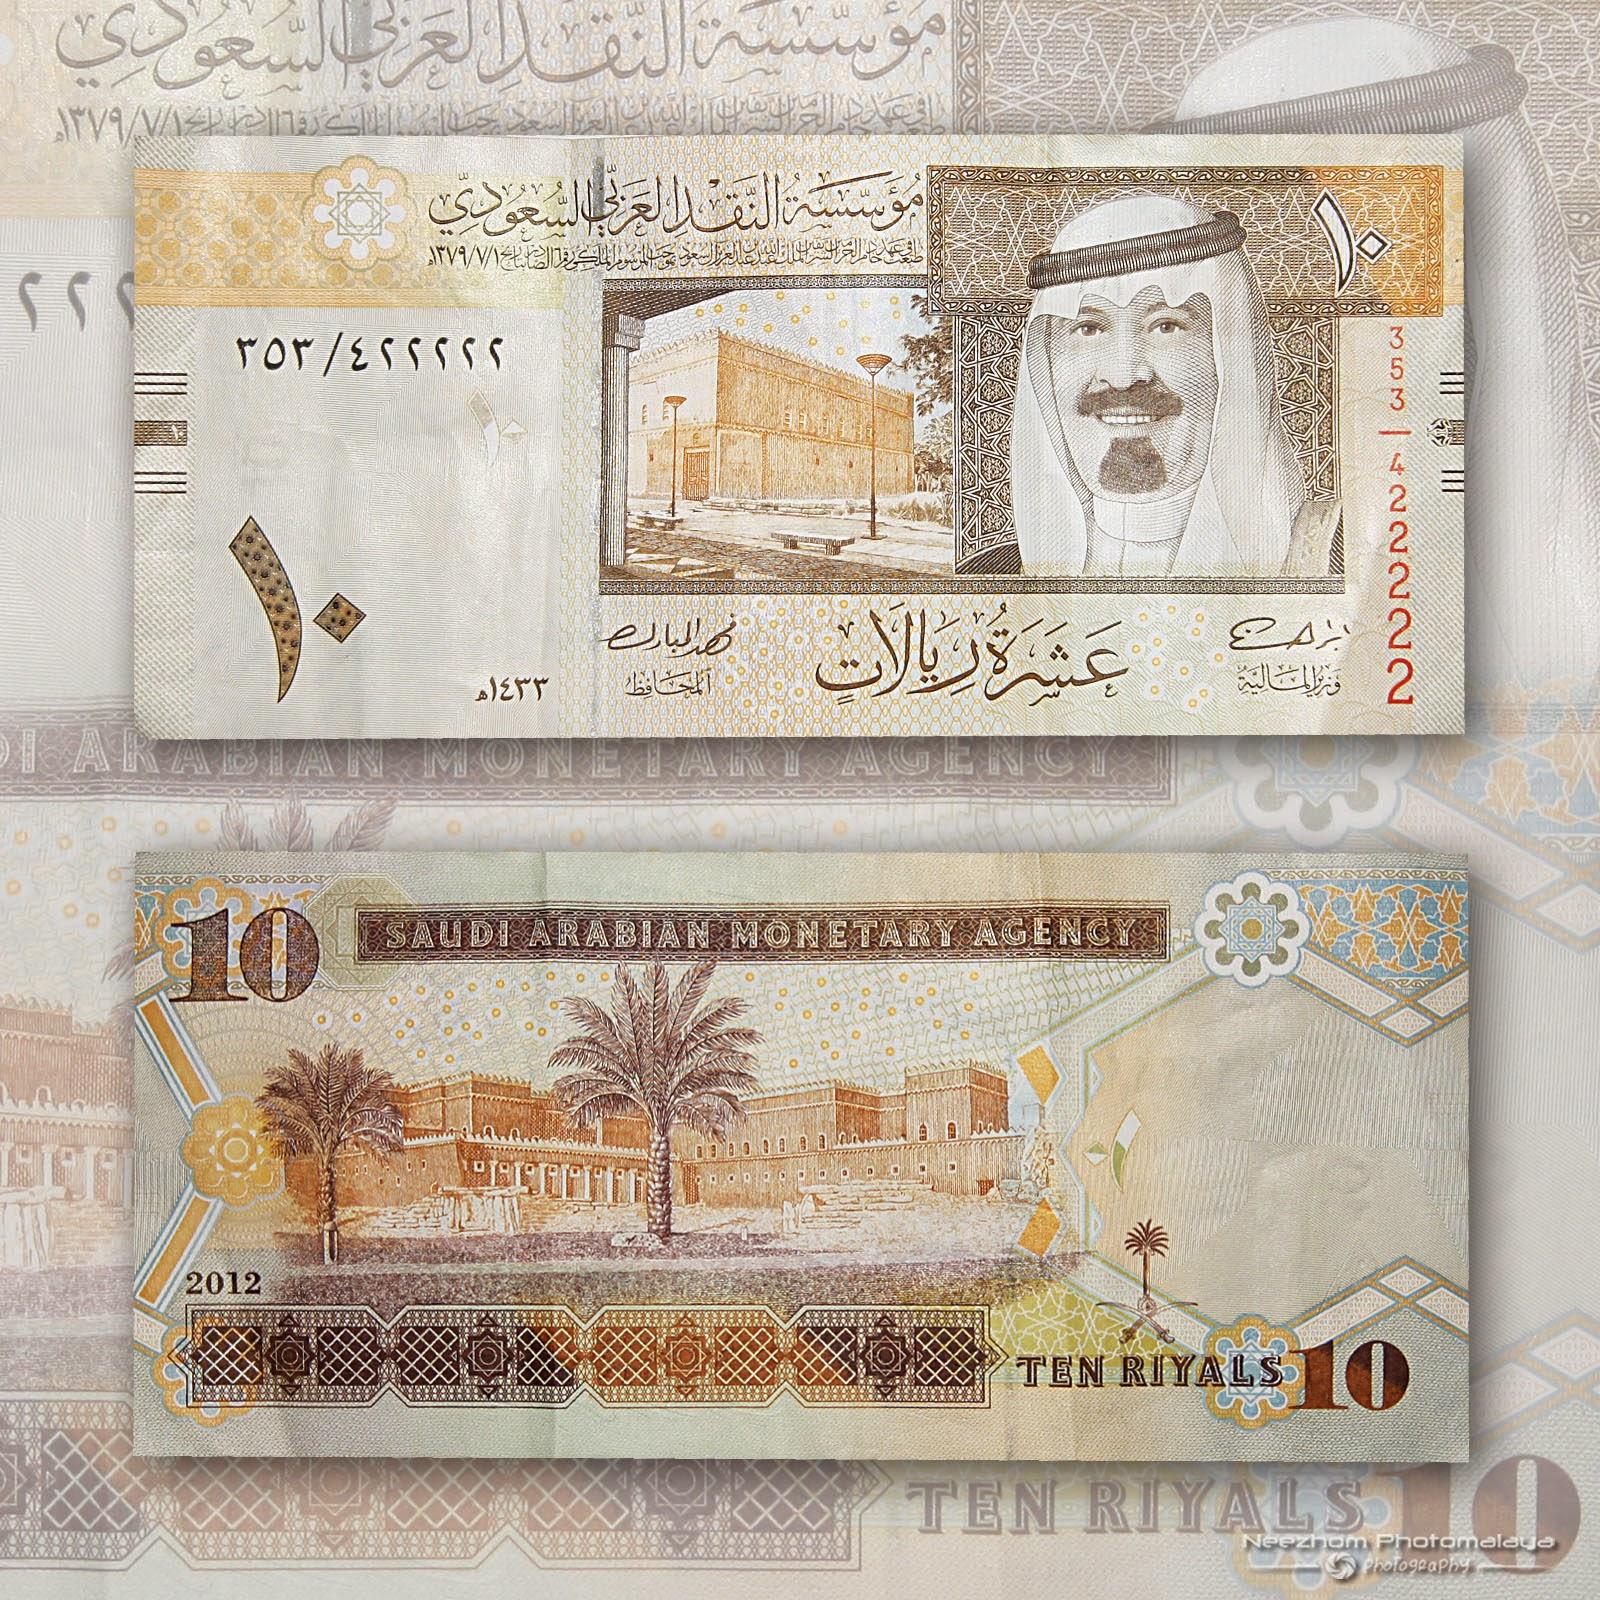 Saudi Arabia 10 Riyals 2012 banknote